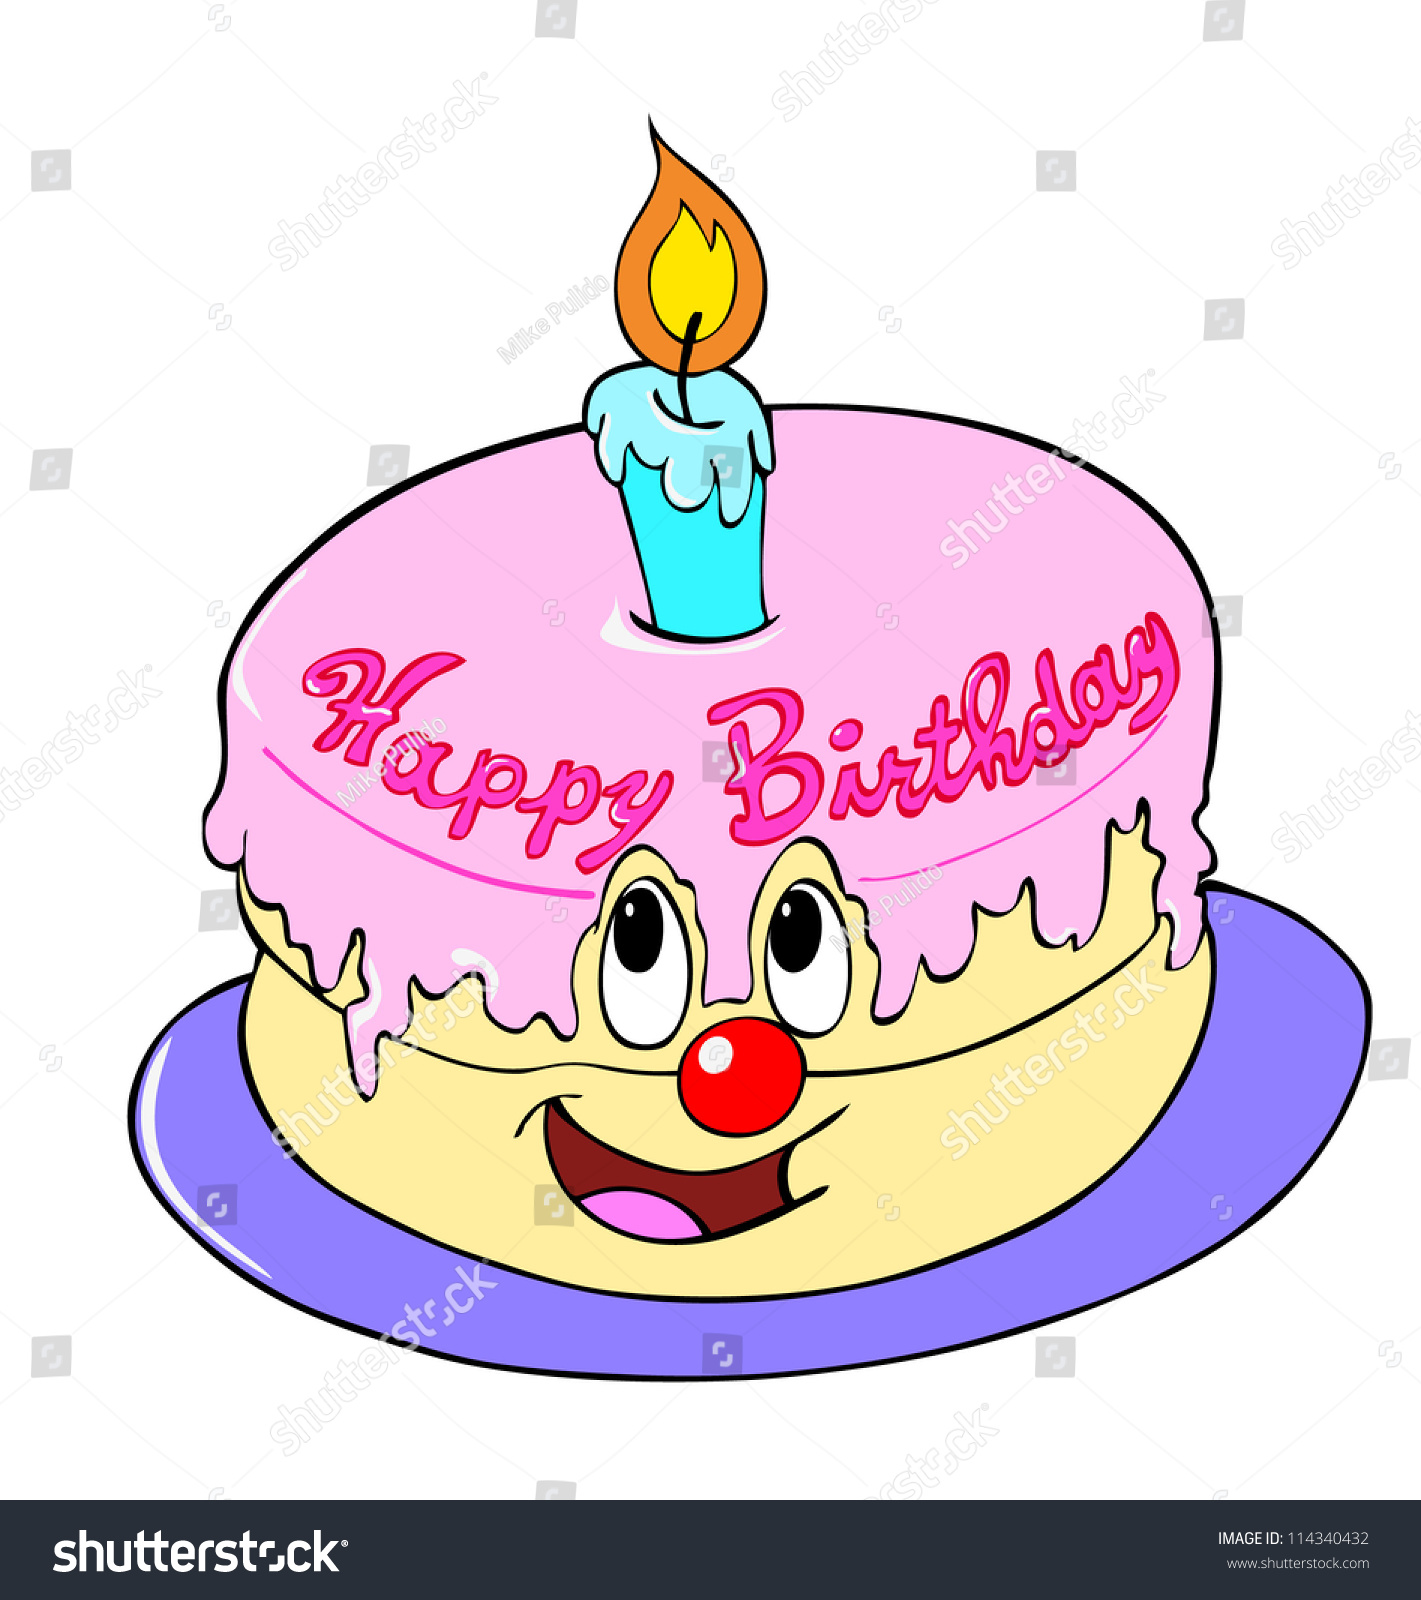 Hand Drawn Cartoon Of A Cake Happy Birthday Cake Stock